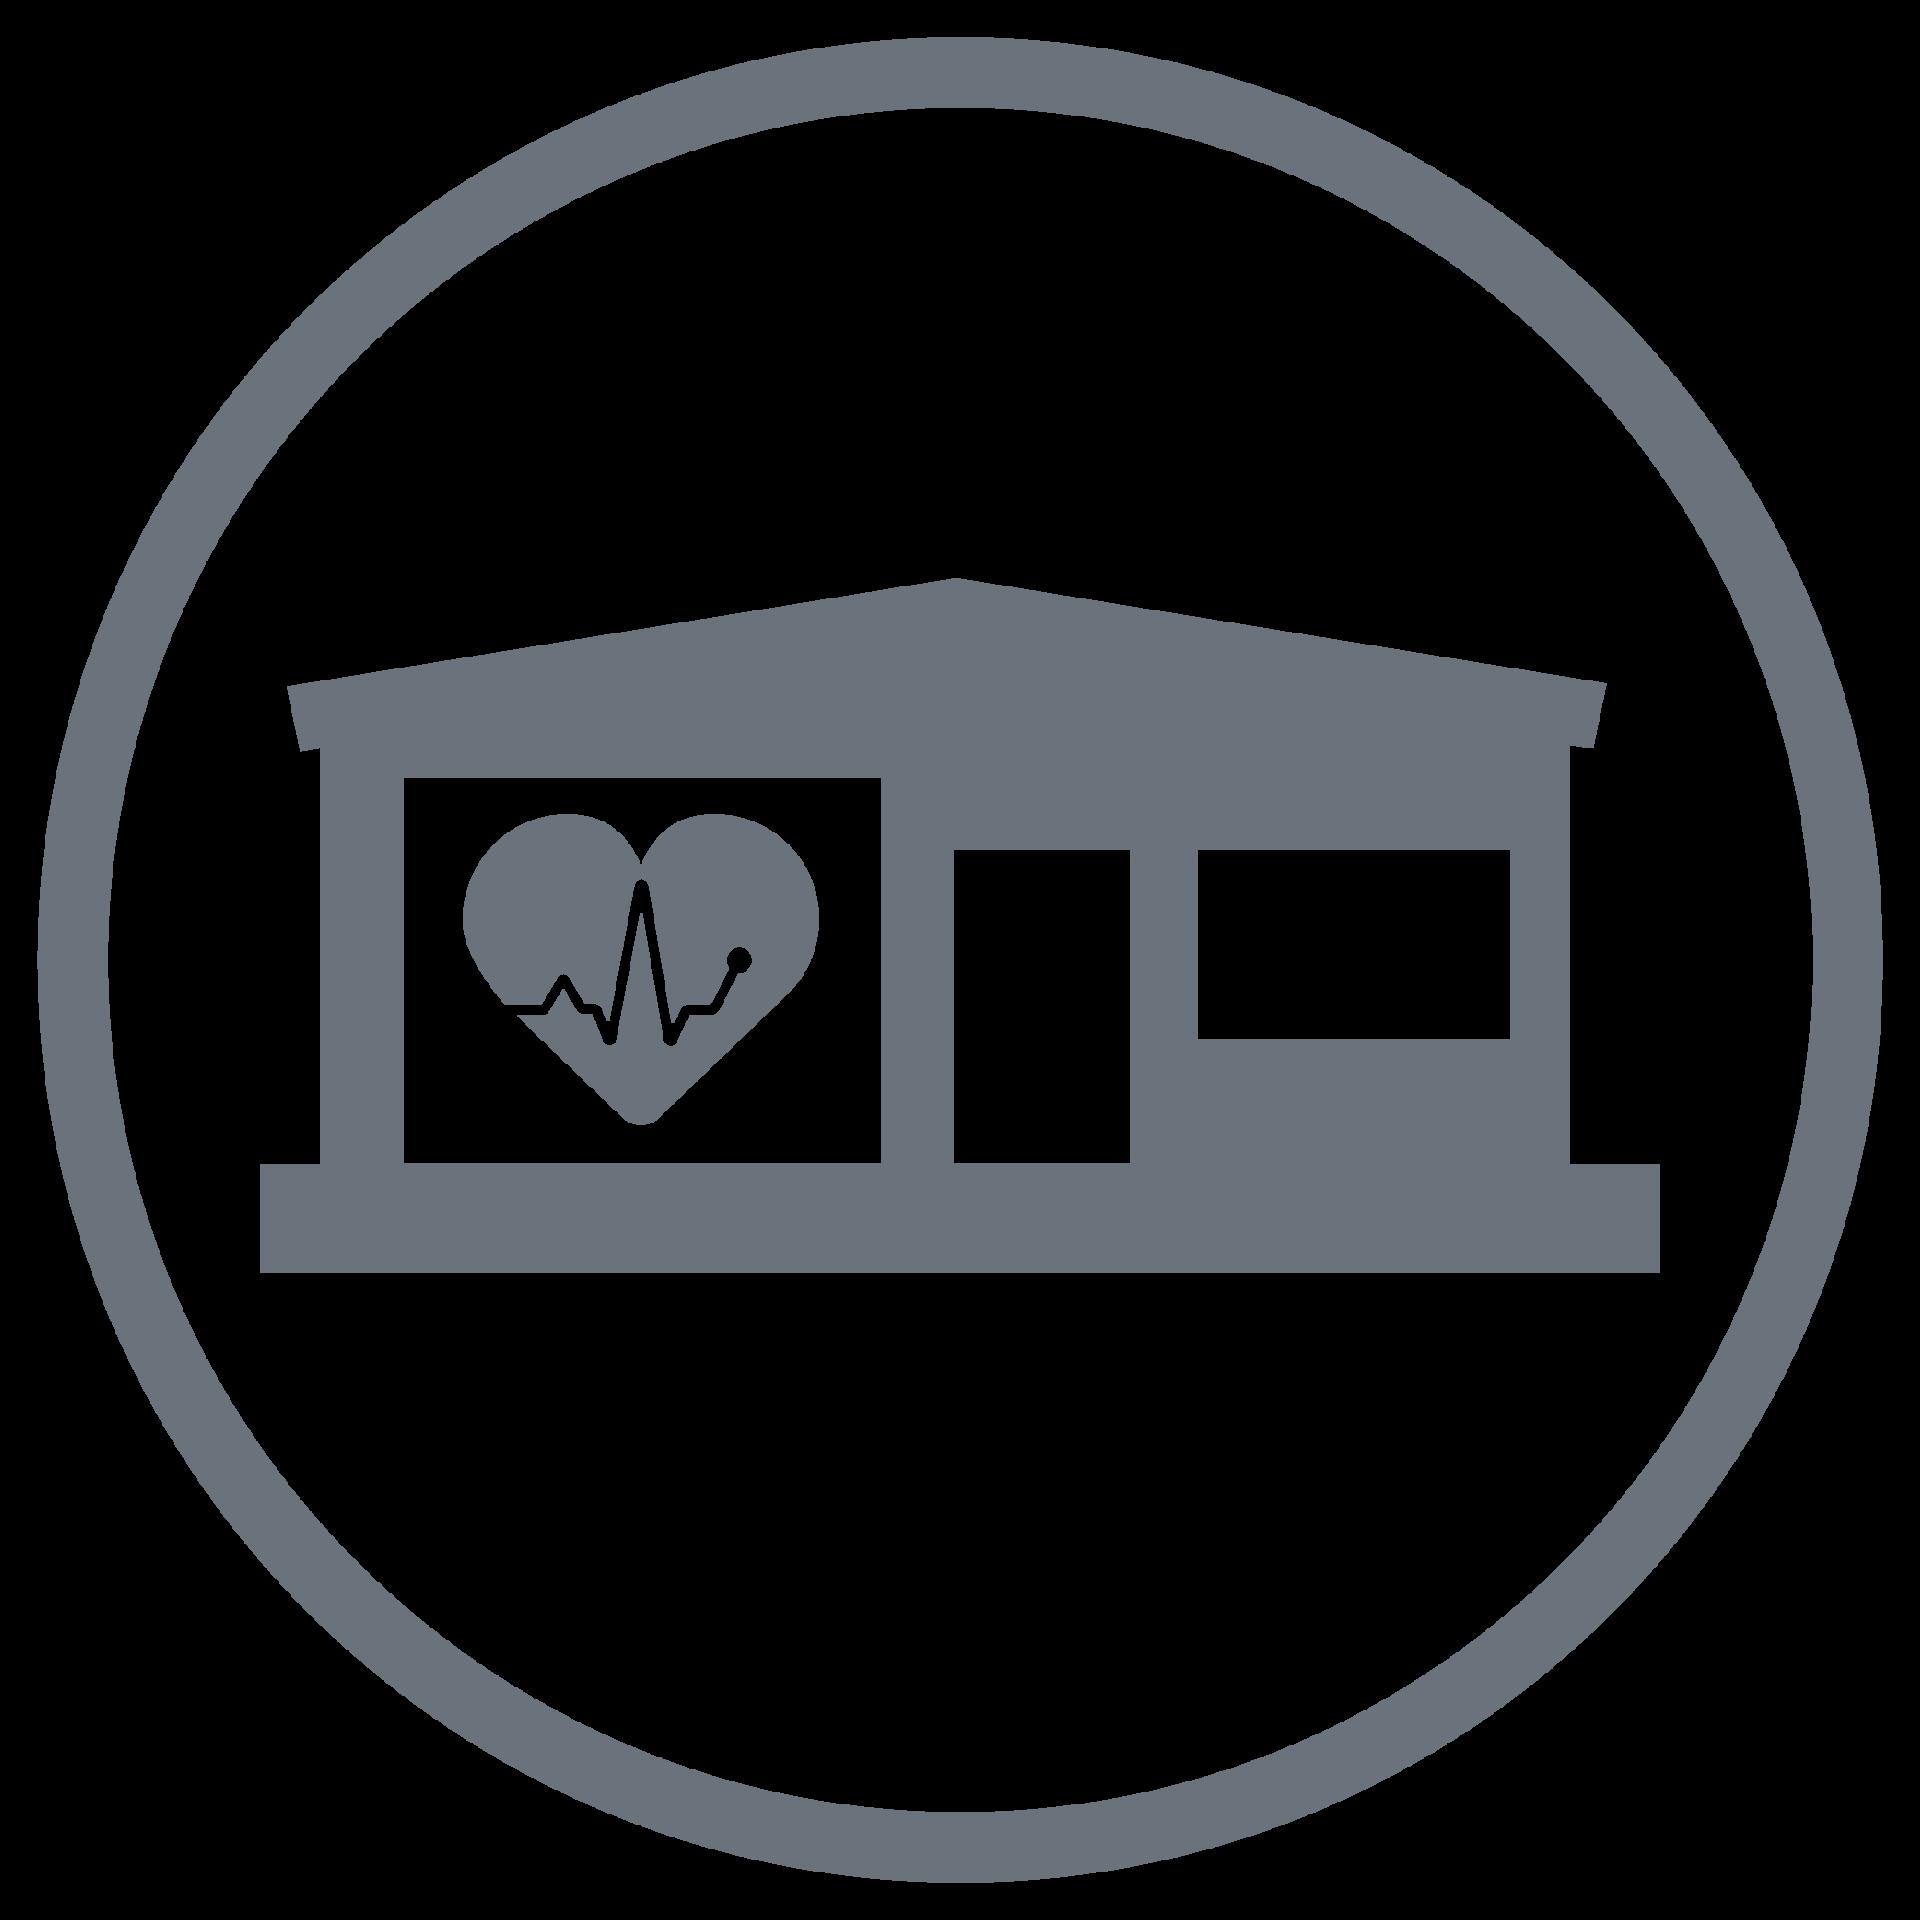 AmbulatoryIcon_Clinics_grey_home heart building